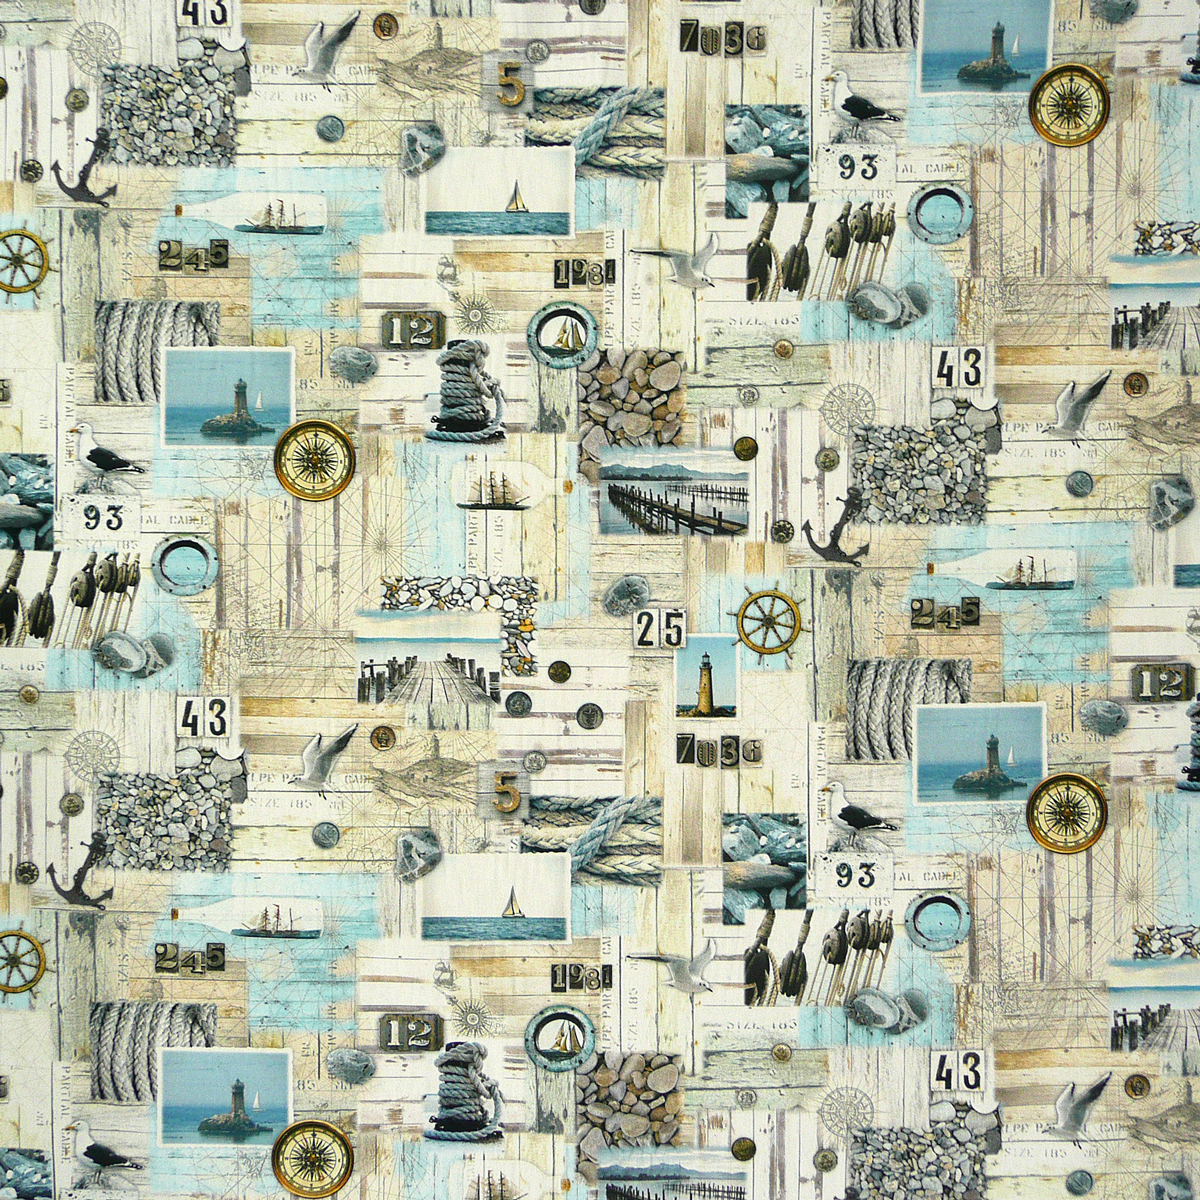 baumwollstoff stoff dekostoff digitaldruck nordisch maritim grau blau stoffe stoffe gemustert. Black Bedroom Furniture Sets. Home Design Ideas